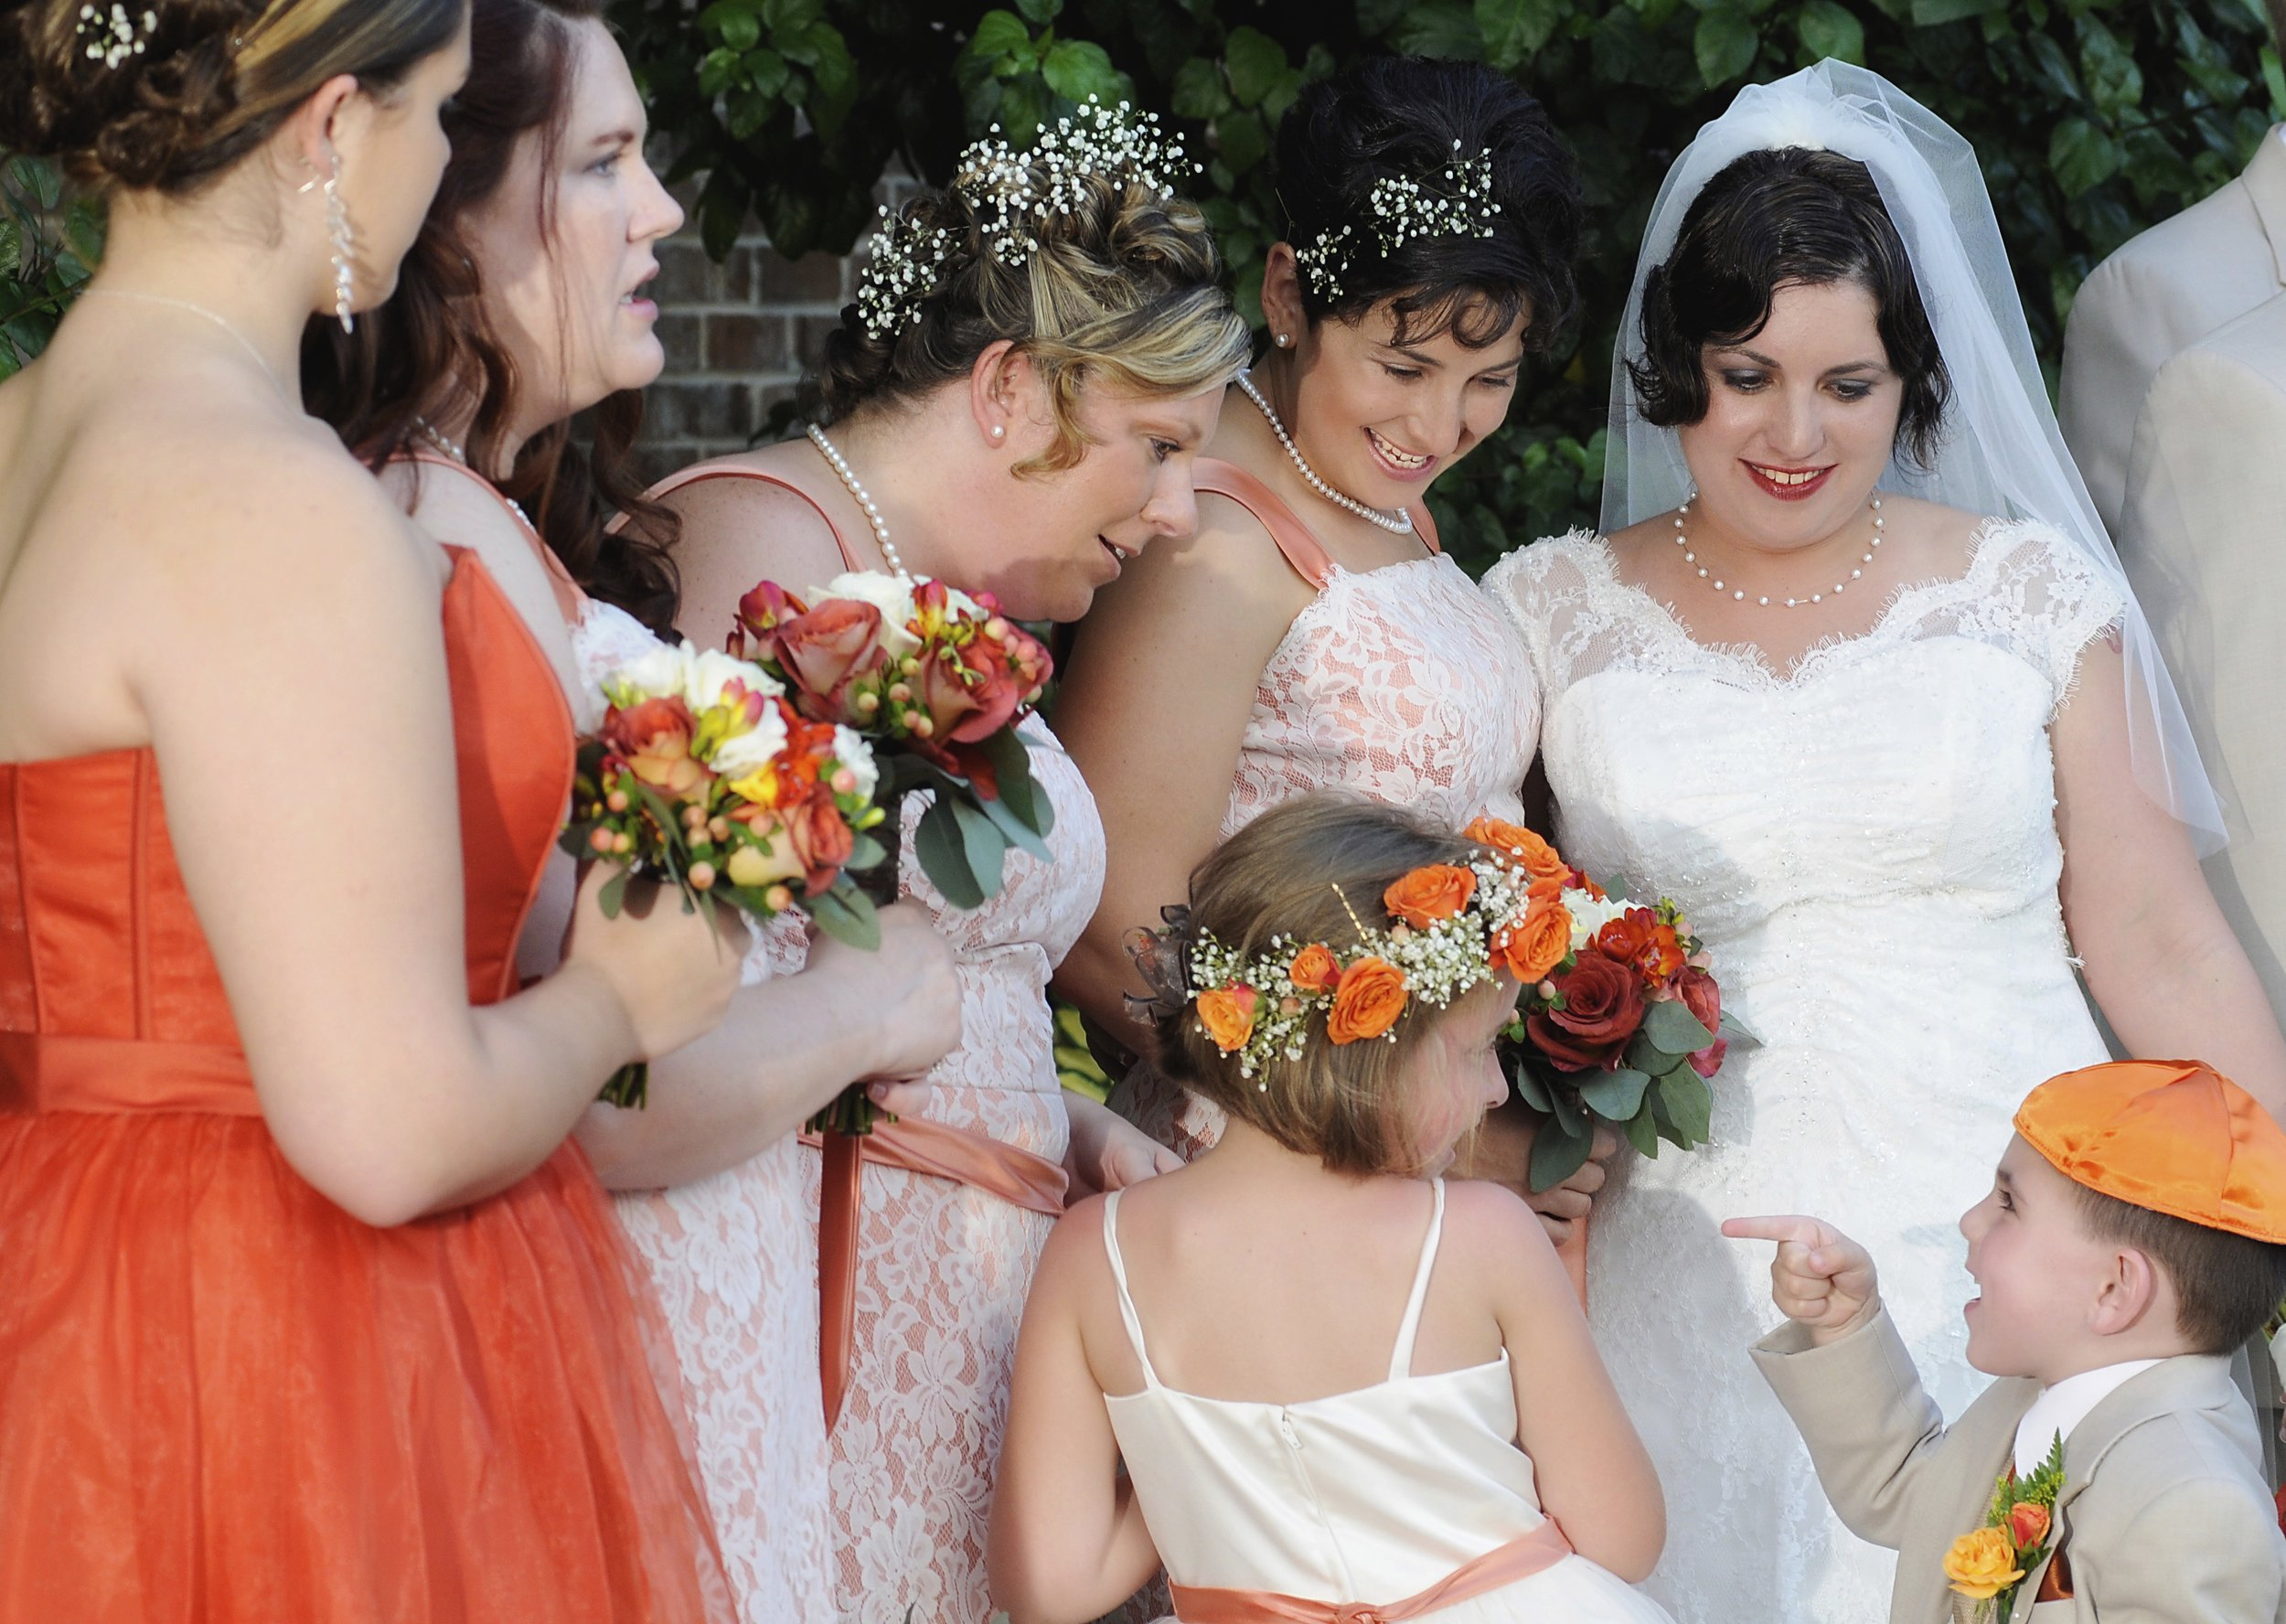 debbie-wedding-best-group-candid-final-version220-YOUNG.jpg